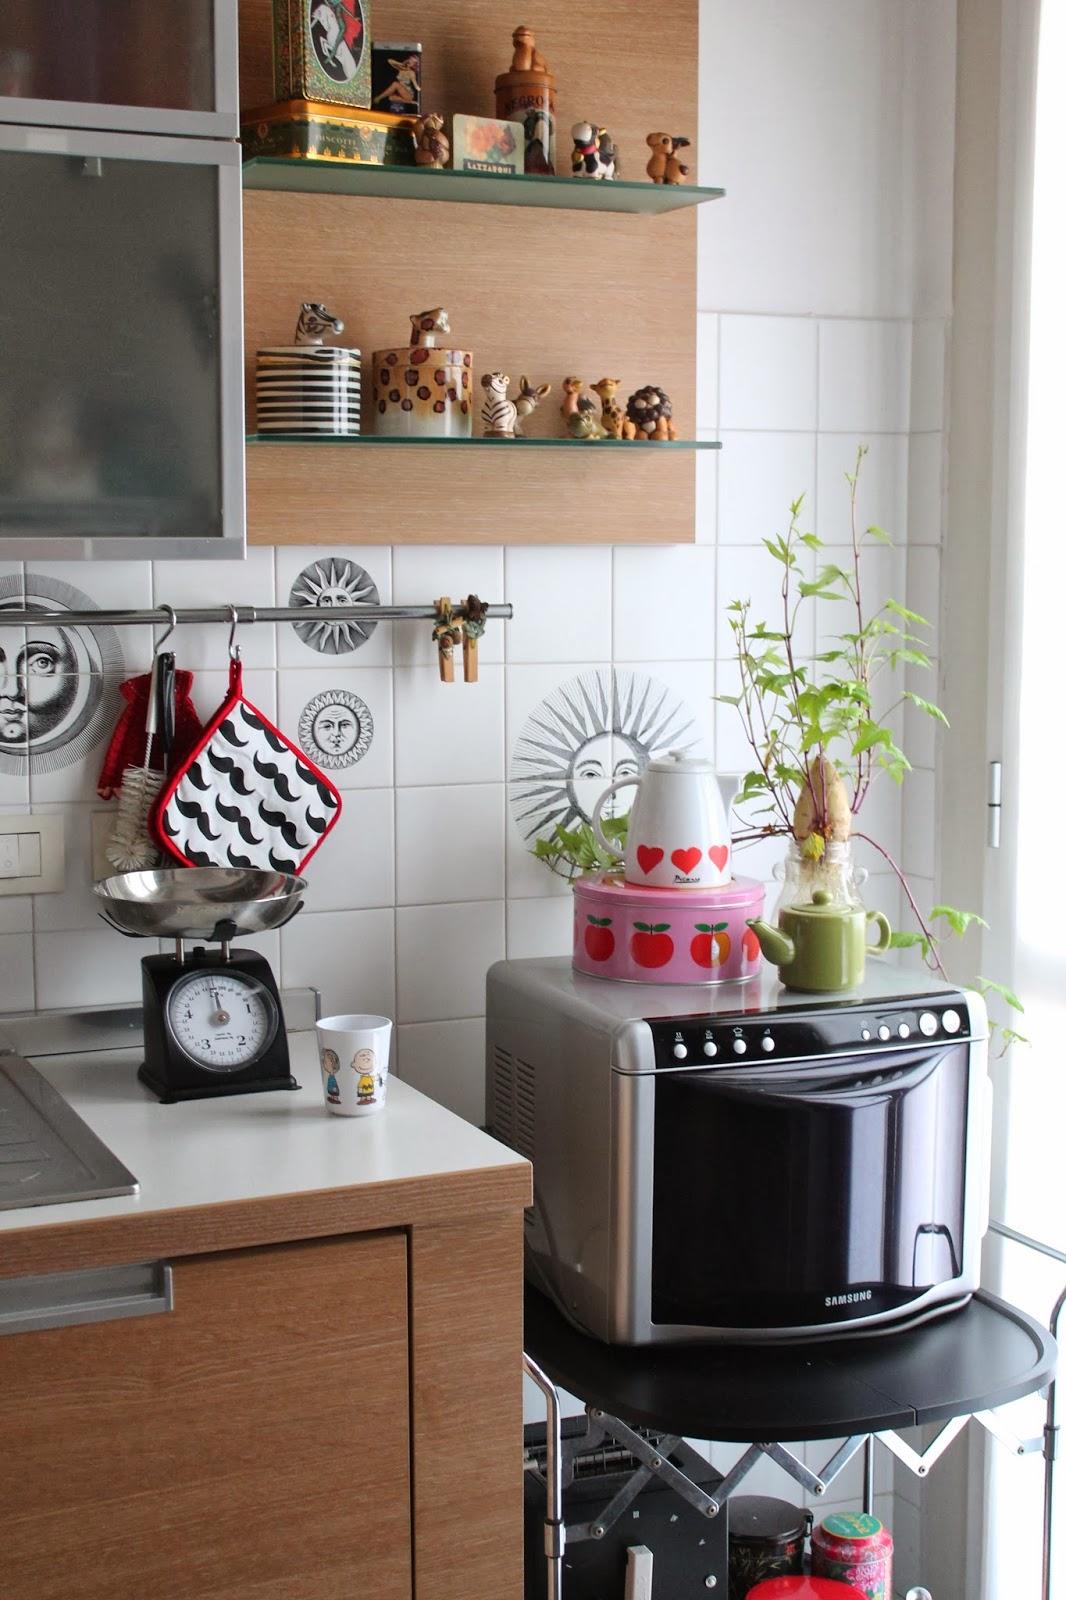 Cucine blog arredamento part 21 - Cucine meravigliose ...